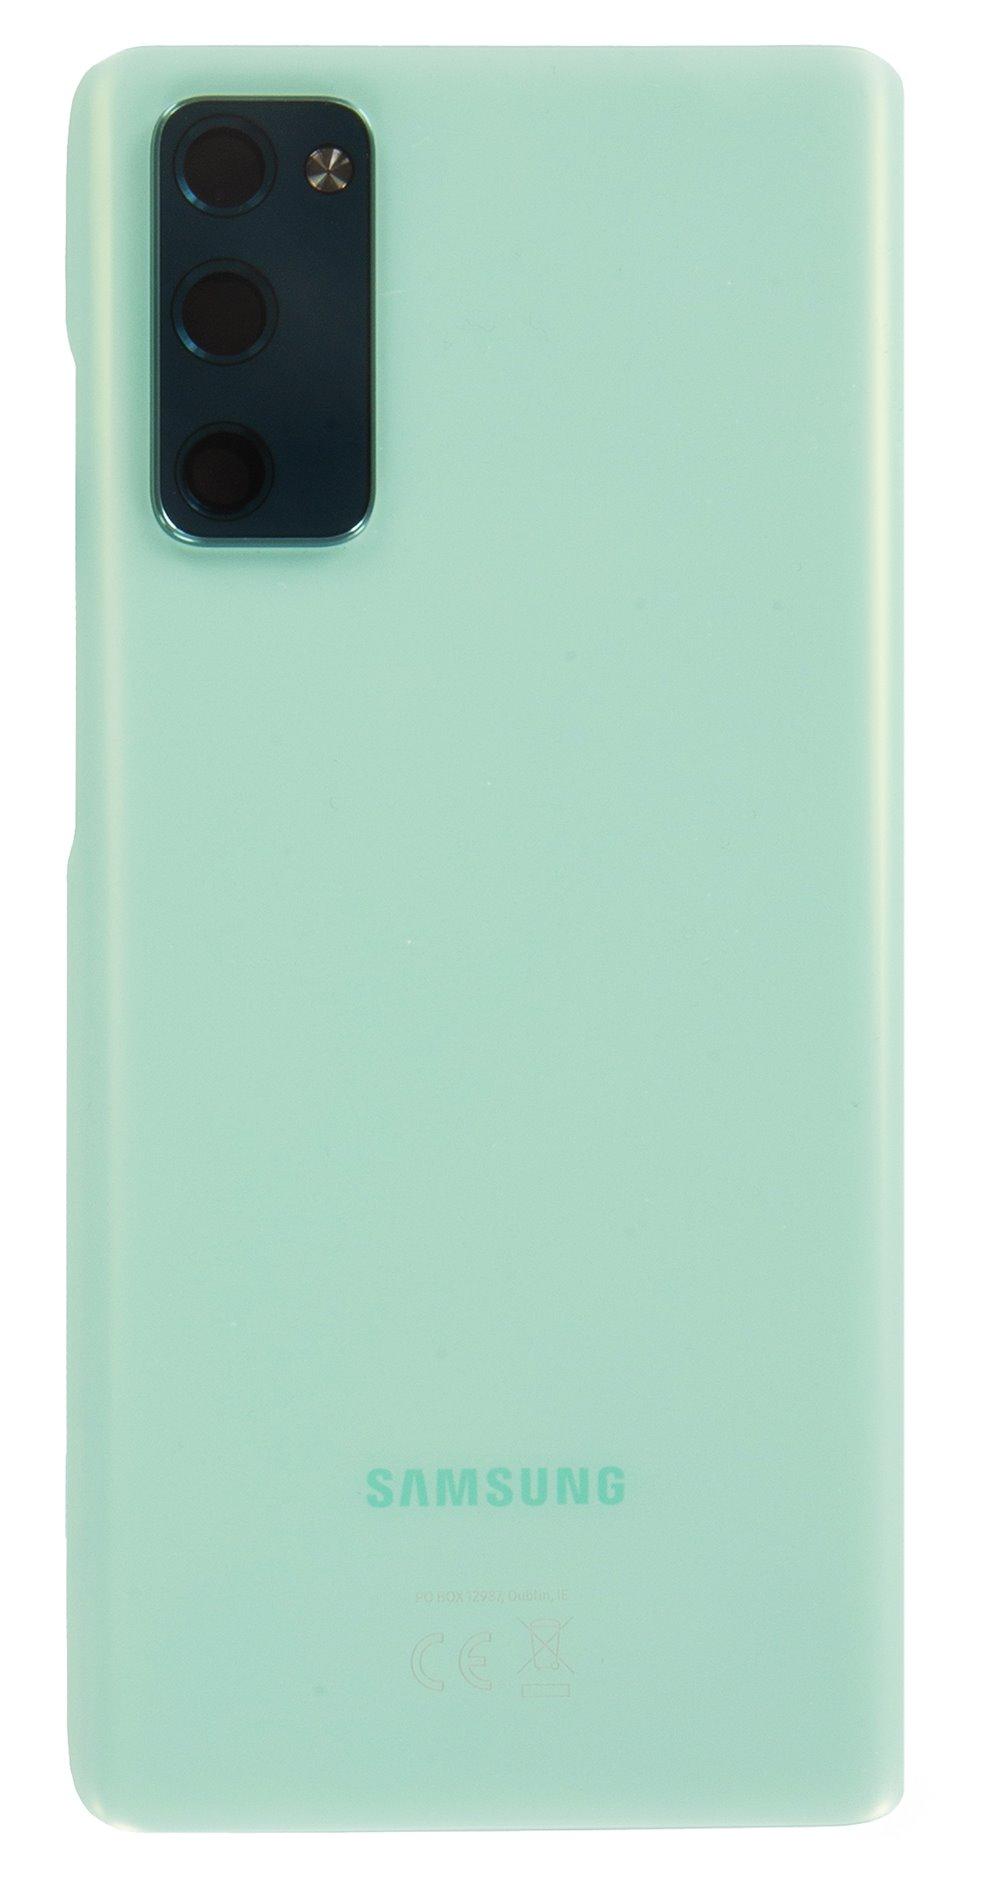 Samsung G781B Galaxy S20 FE 5G Kryt Baterie Cloud Mint (Service Pack)